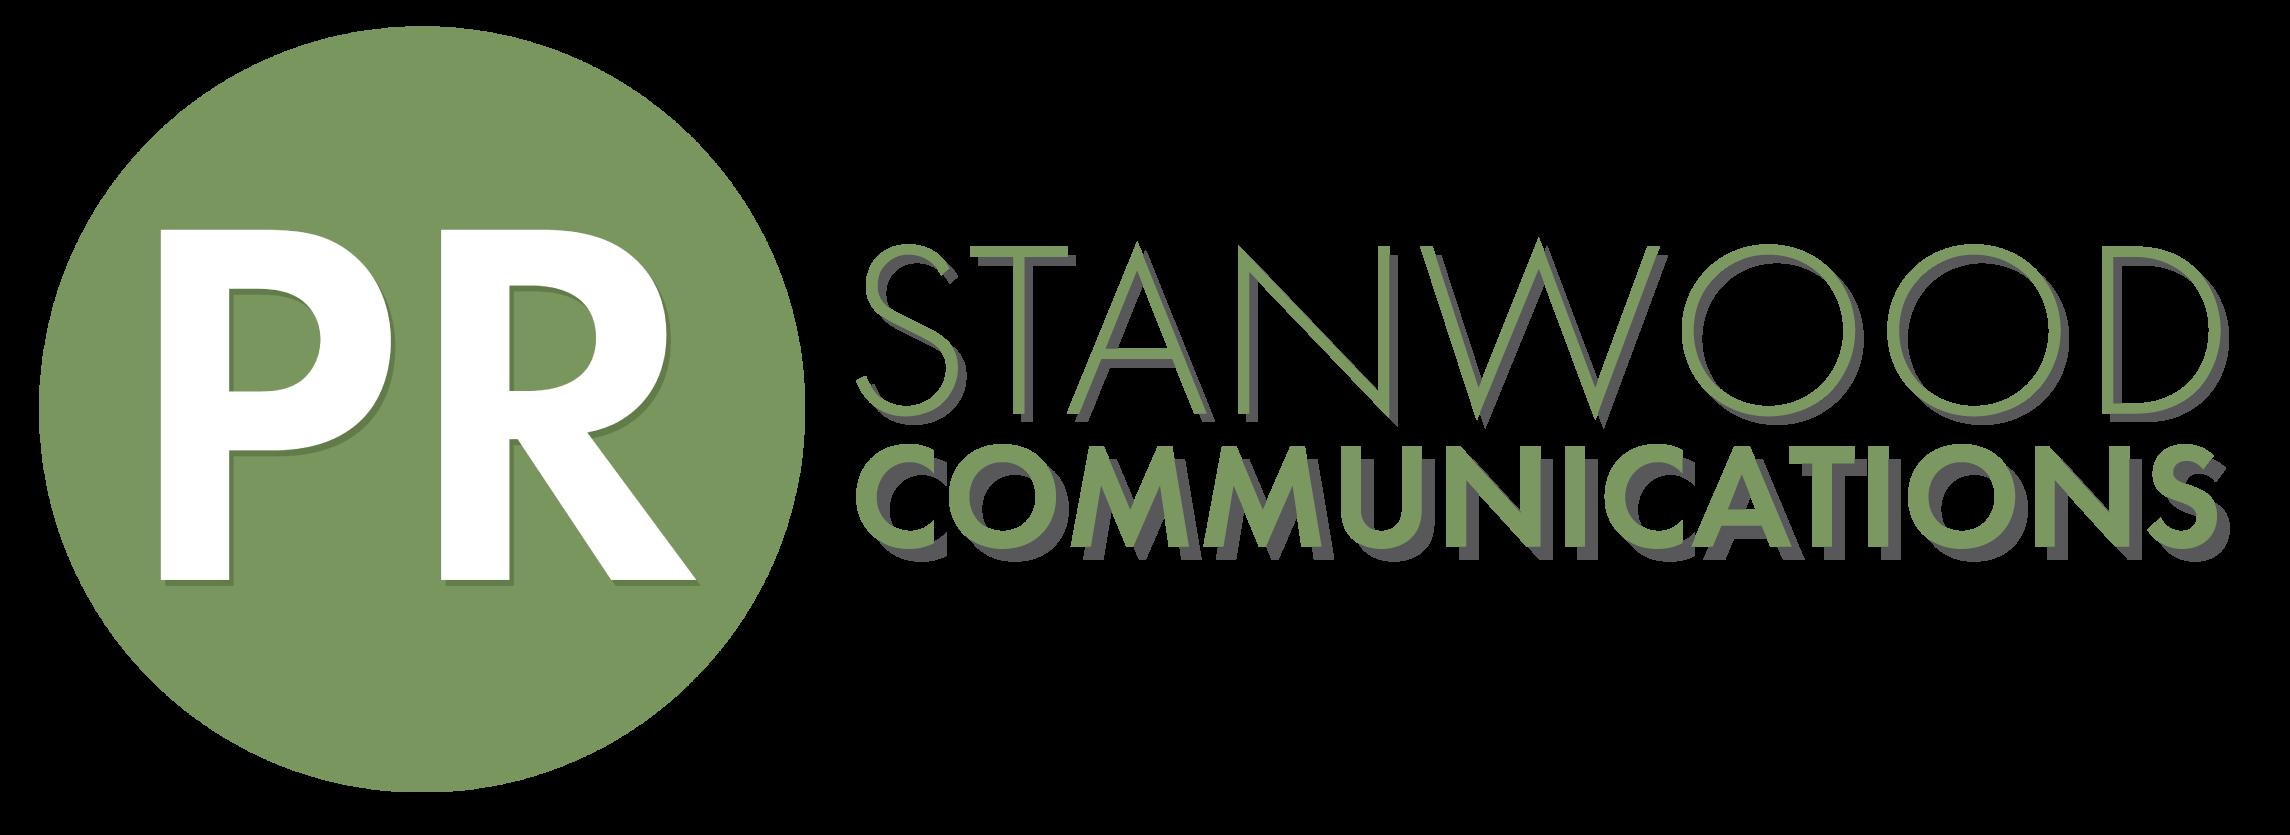 STANWOODPR